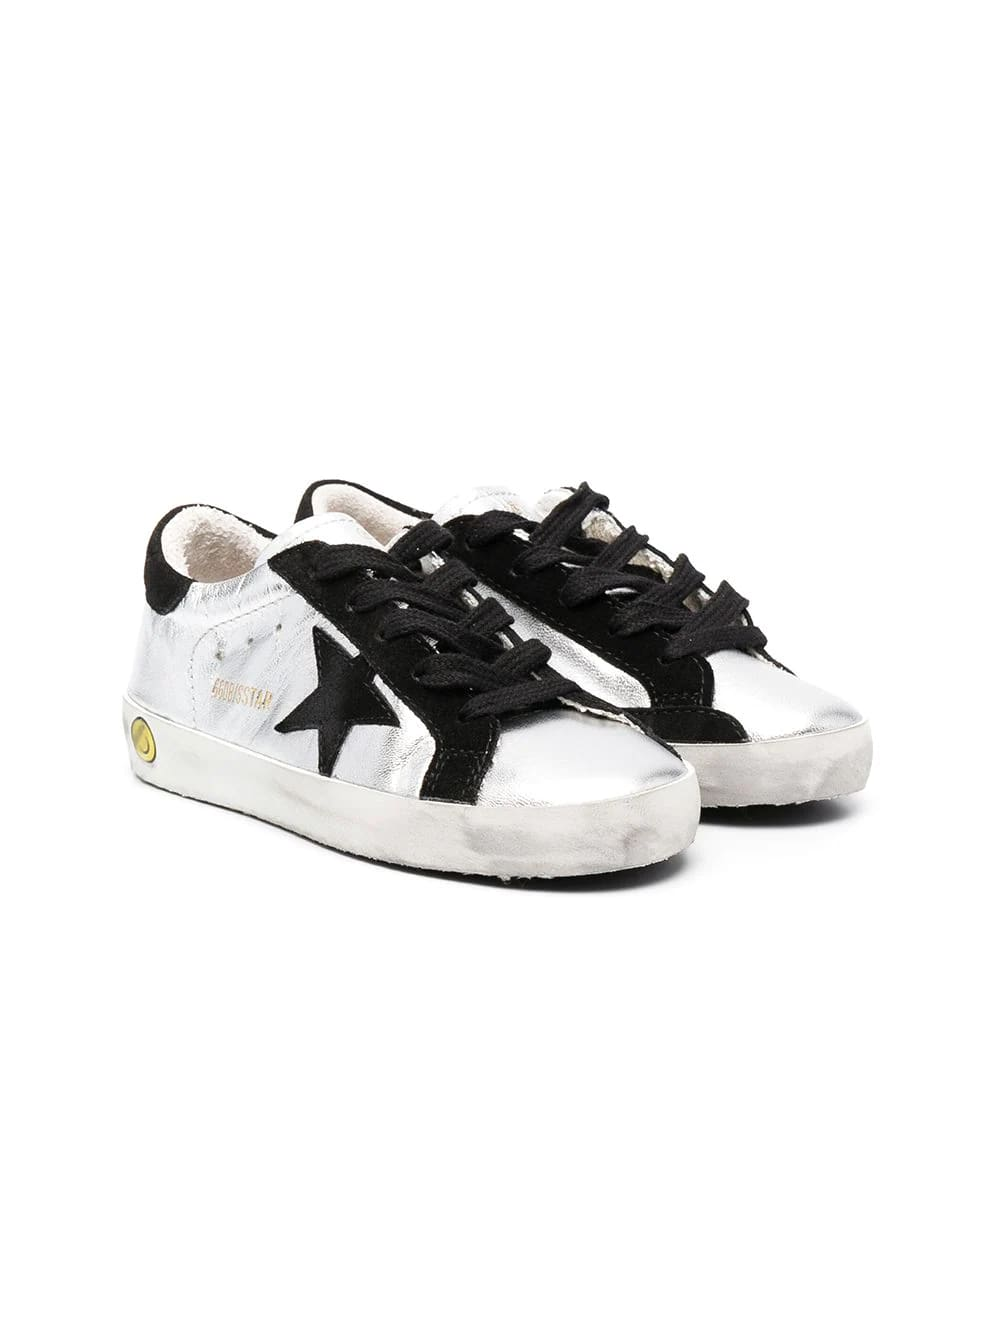 Golden Goose Junior Metallic Silver Super-star Sneakers With Black Suede Details